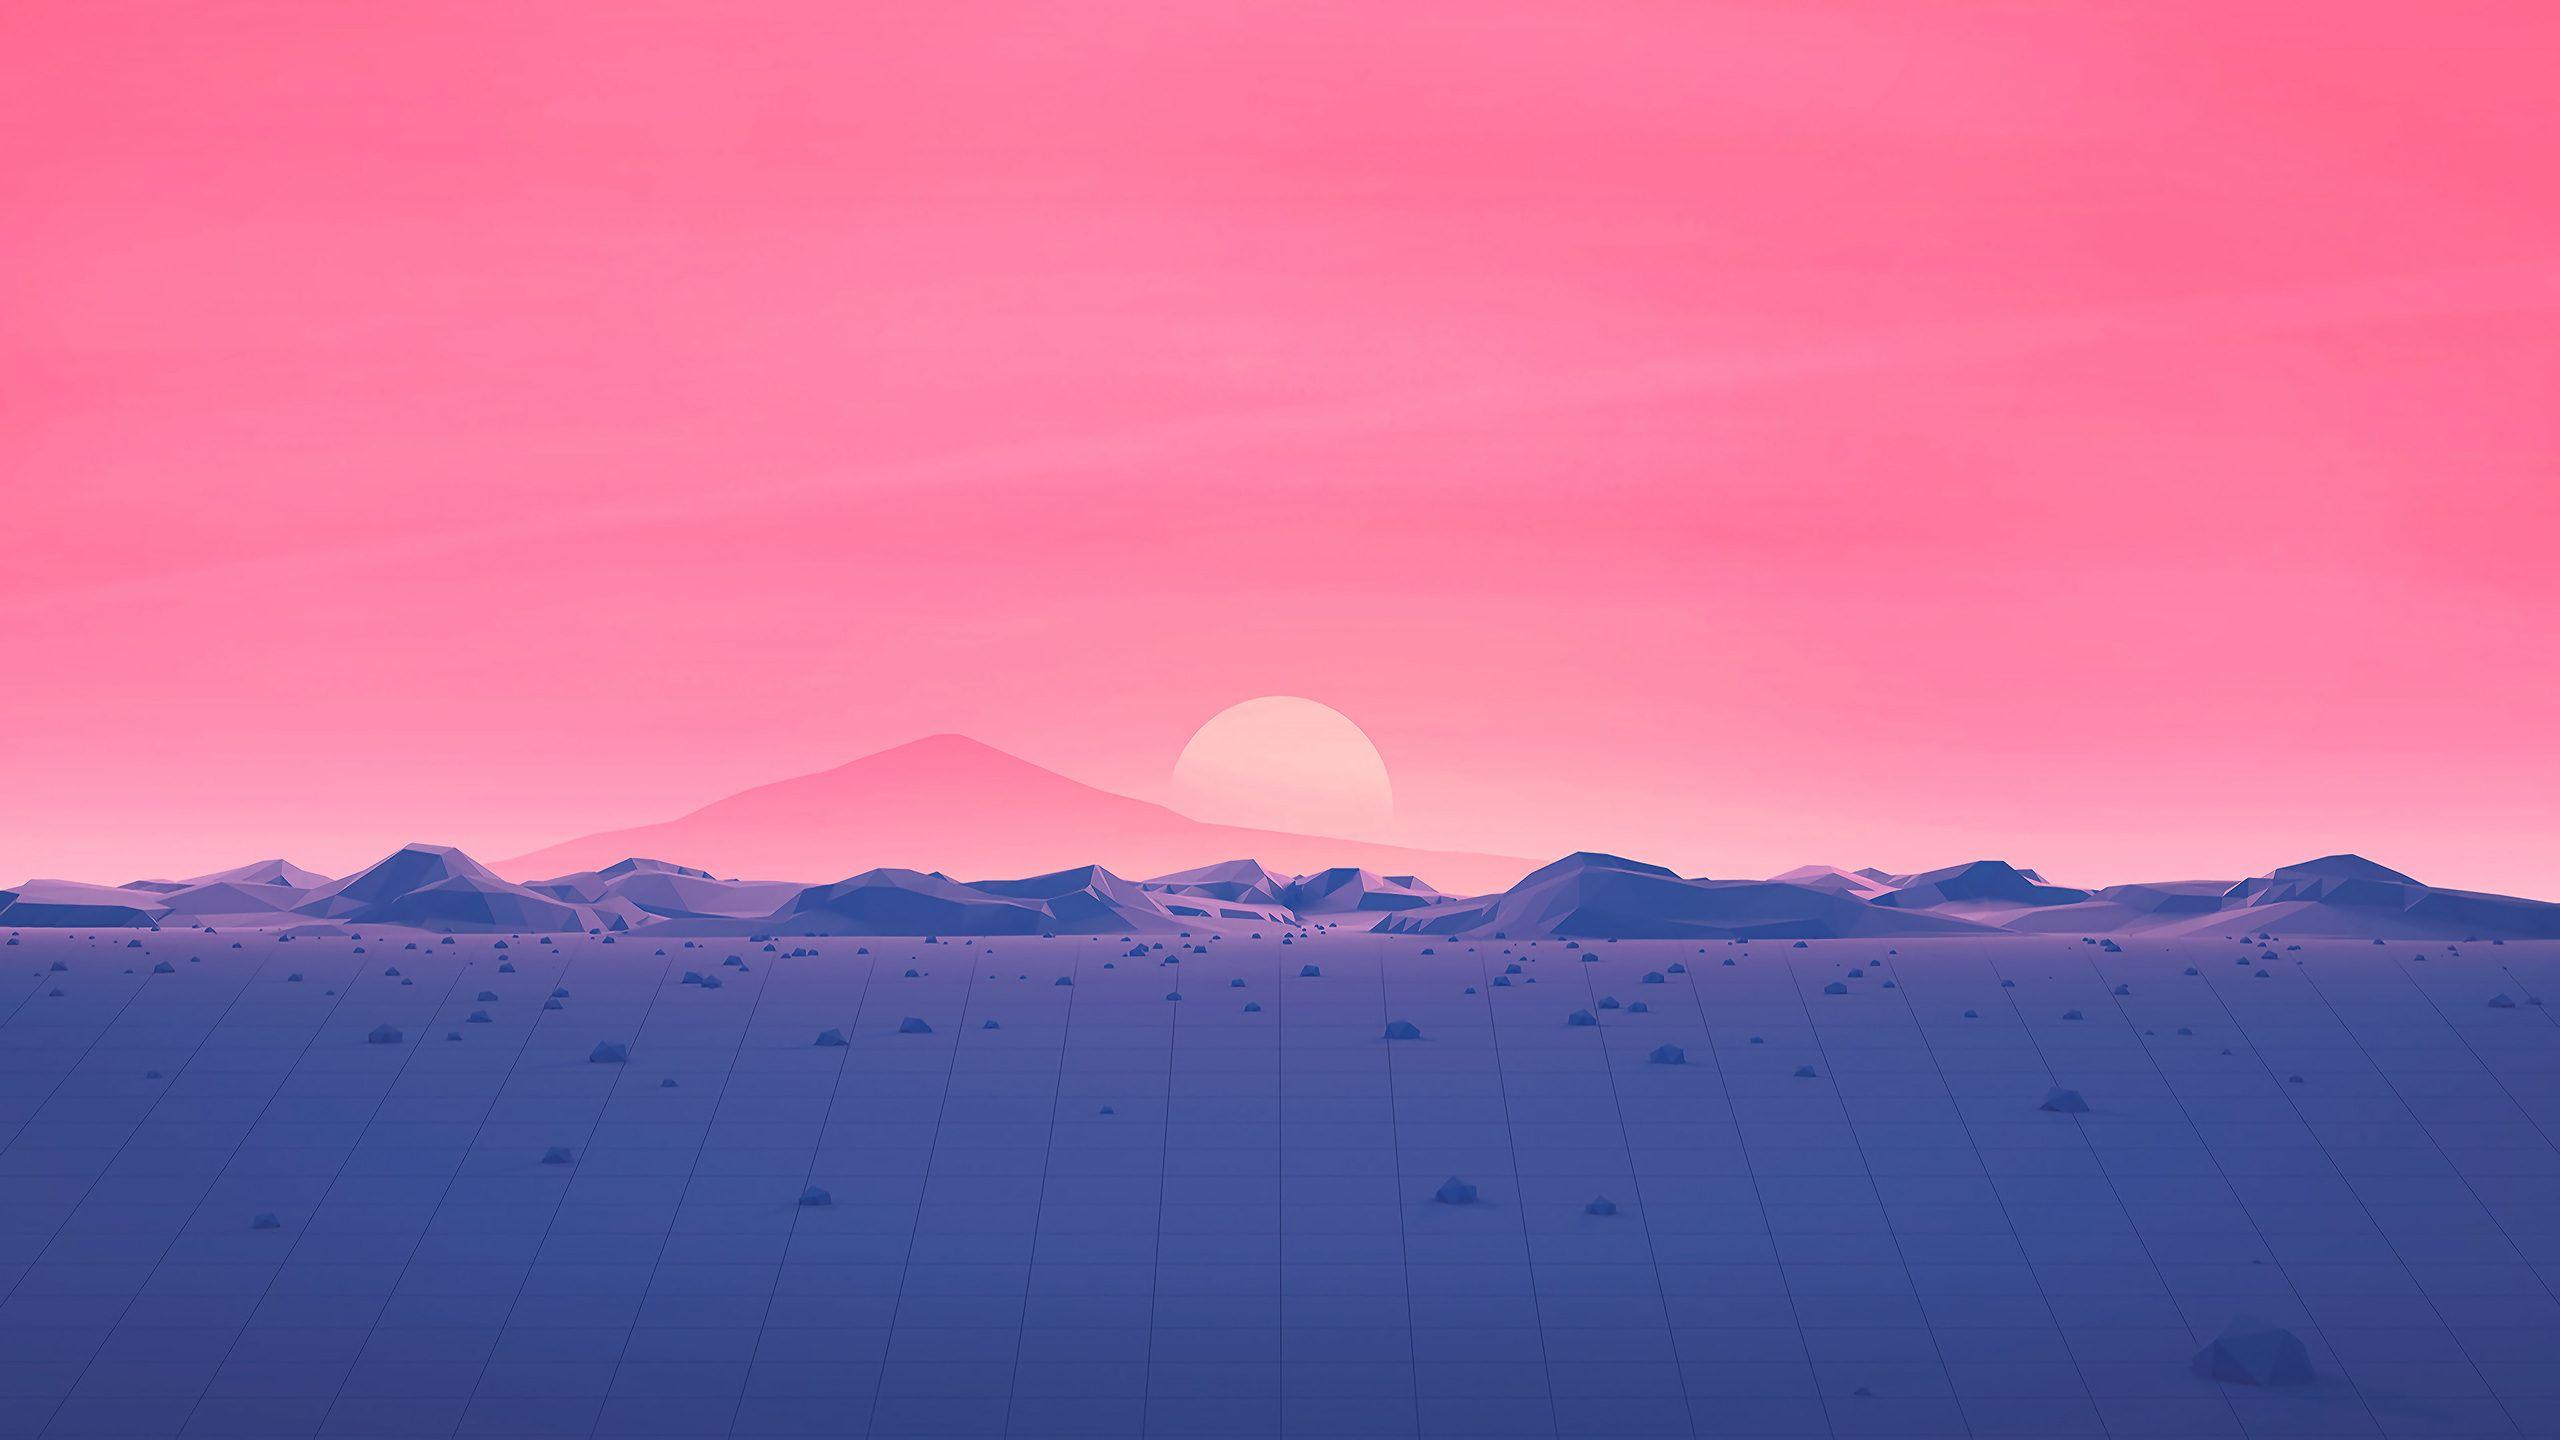 Polygon Surface Mountains Sunset [2560x1440] 배경, 컴퓨터 바탕